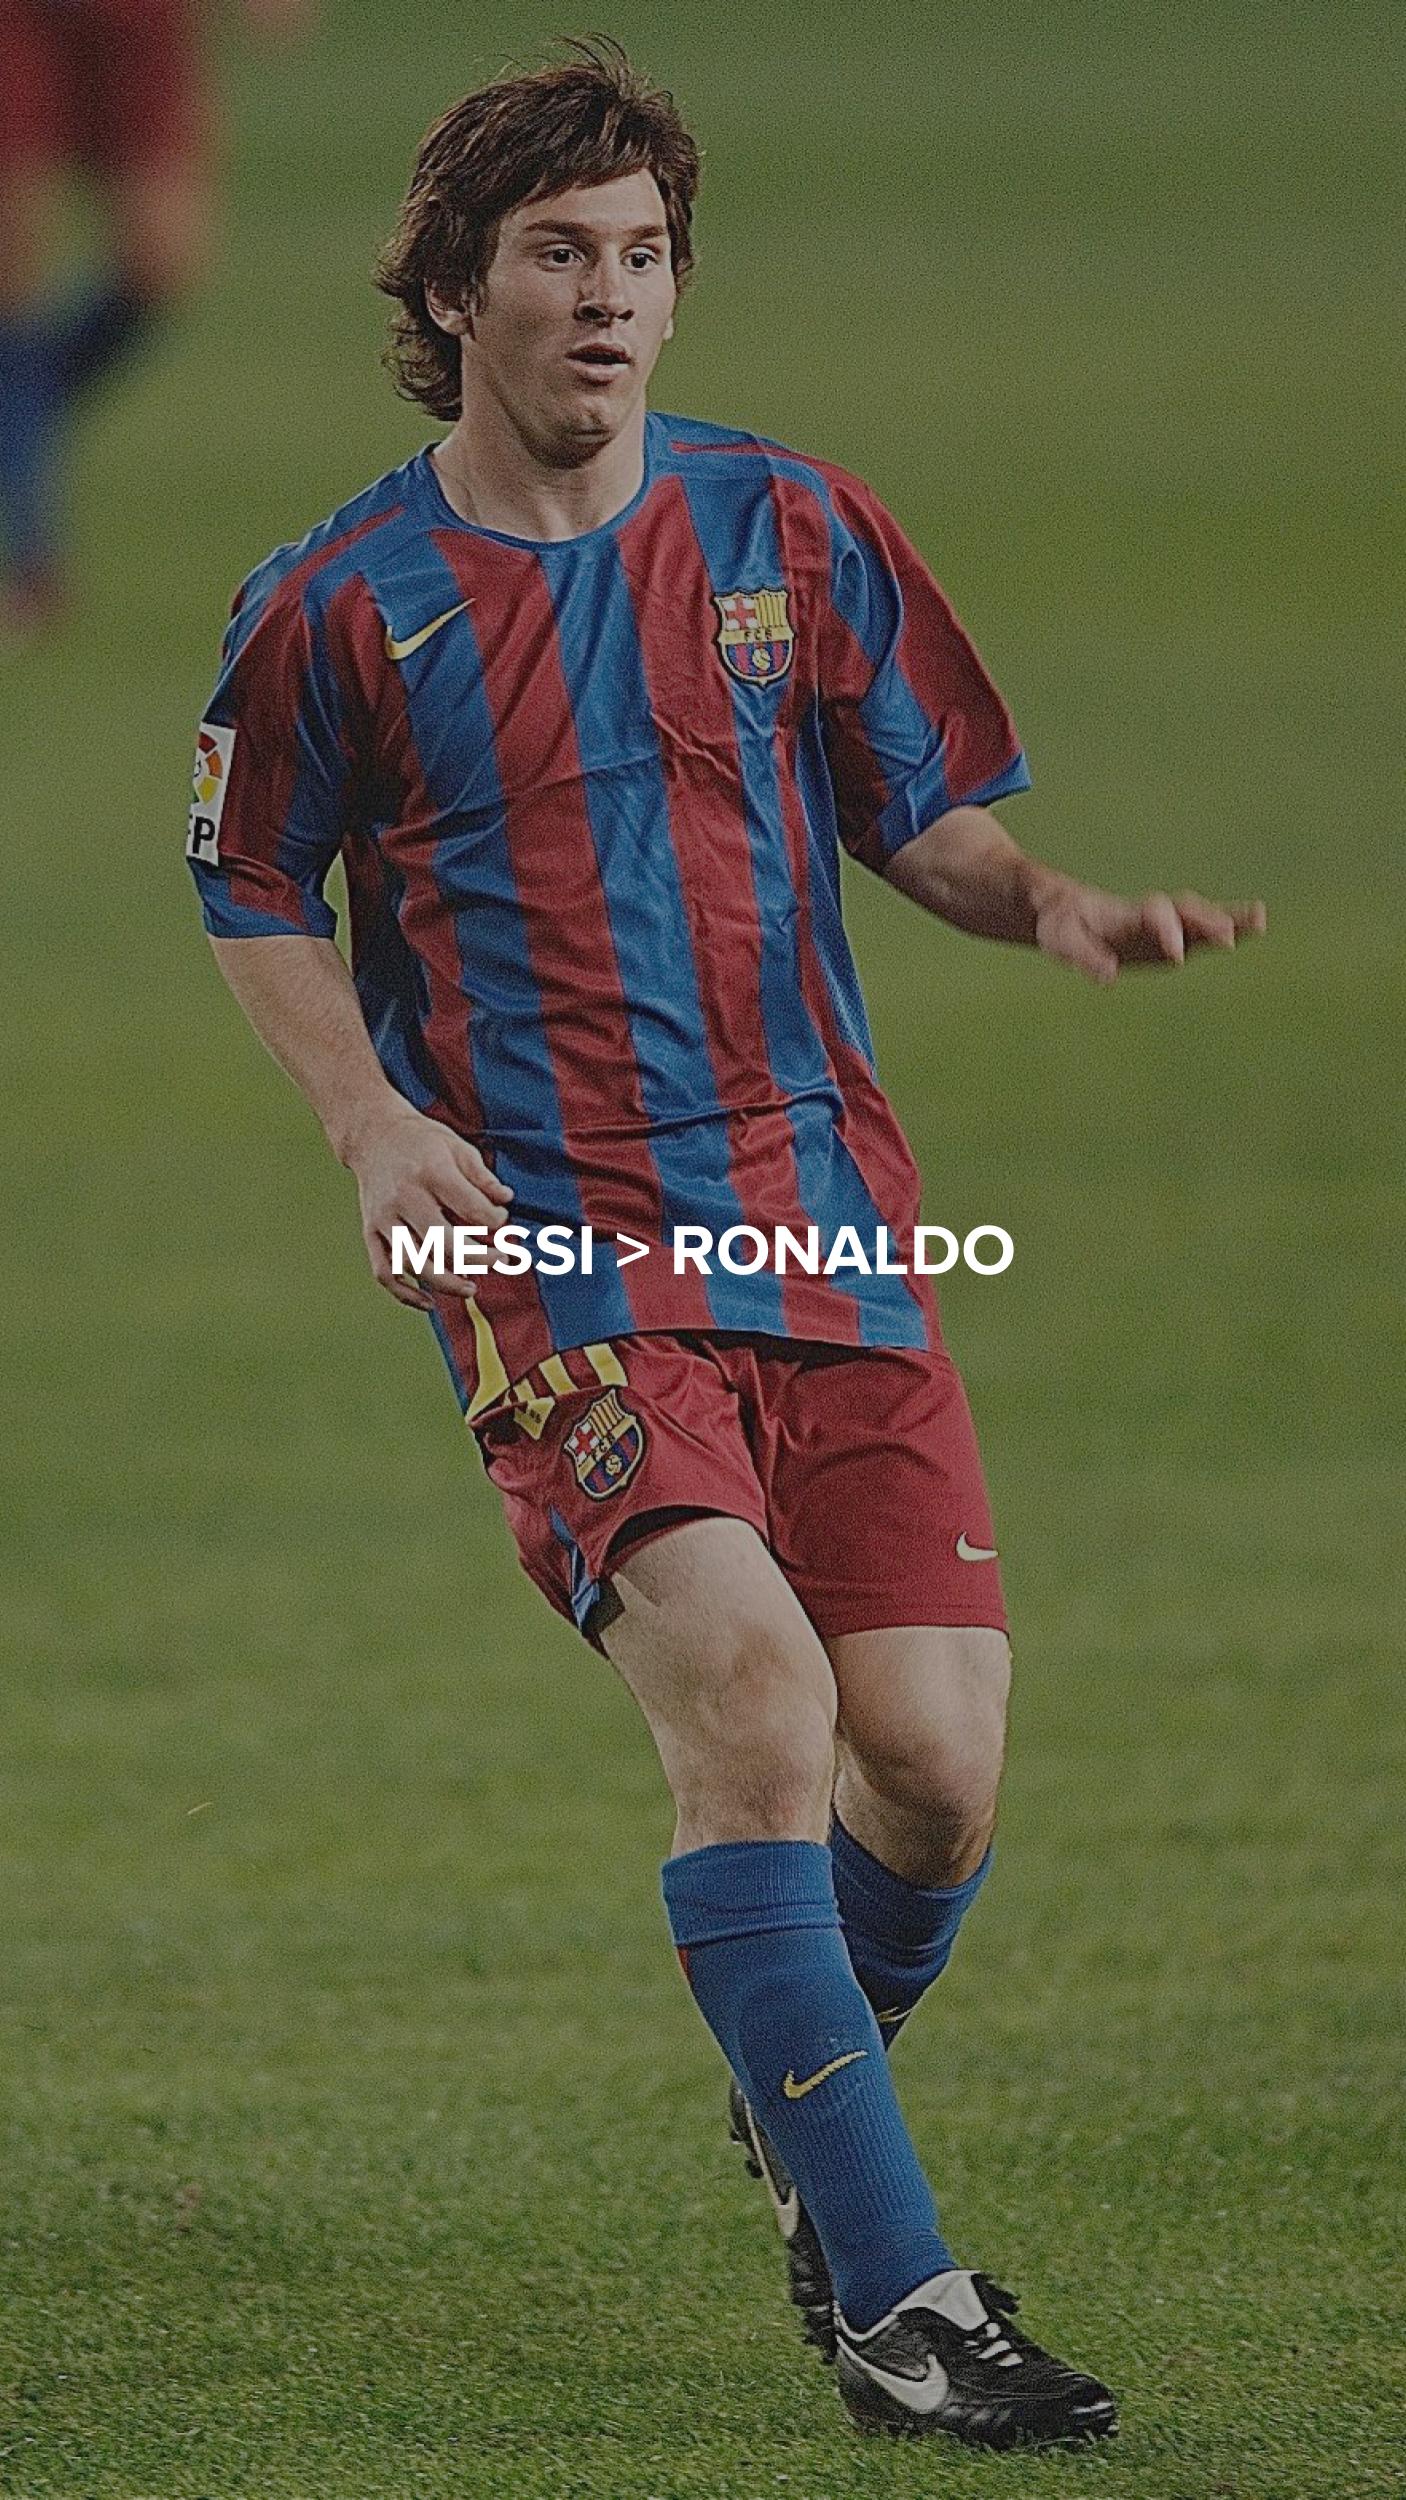 Messi Ronaldo Soccer Wallpaper Messi Ronaldo Mens Tops